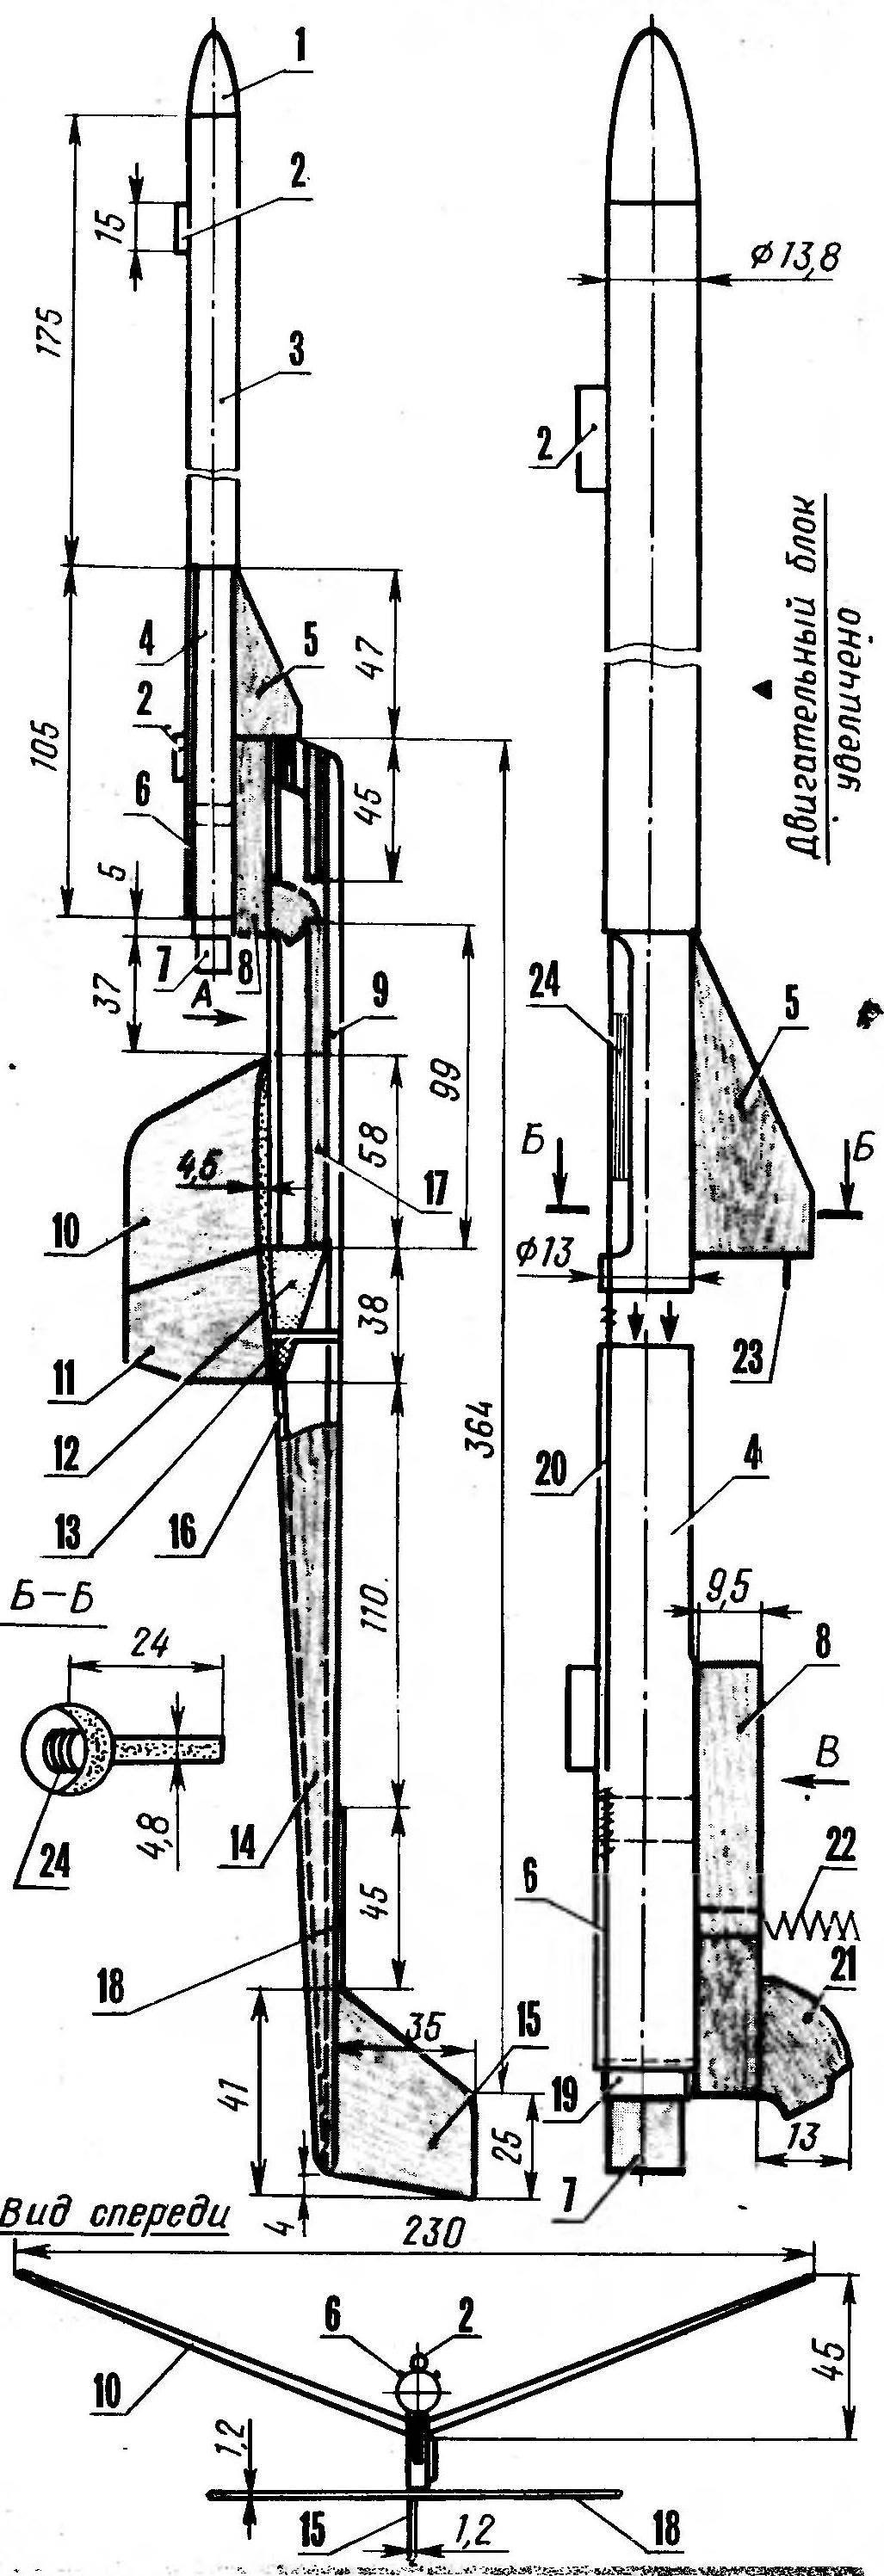 Модель ракетоплана Р. Паркса (США)